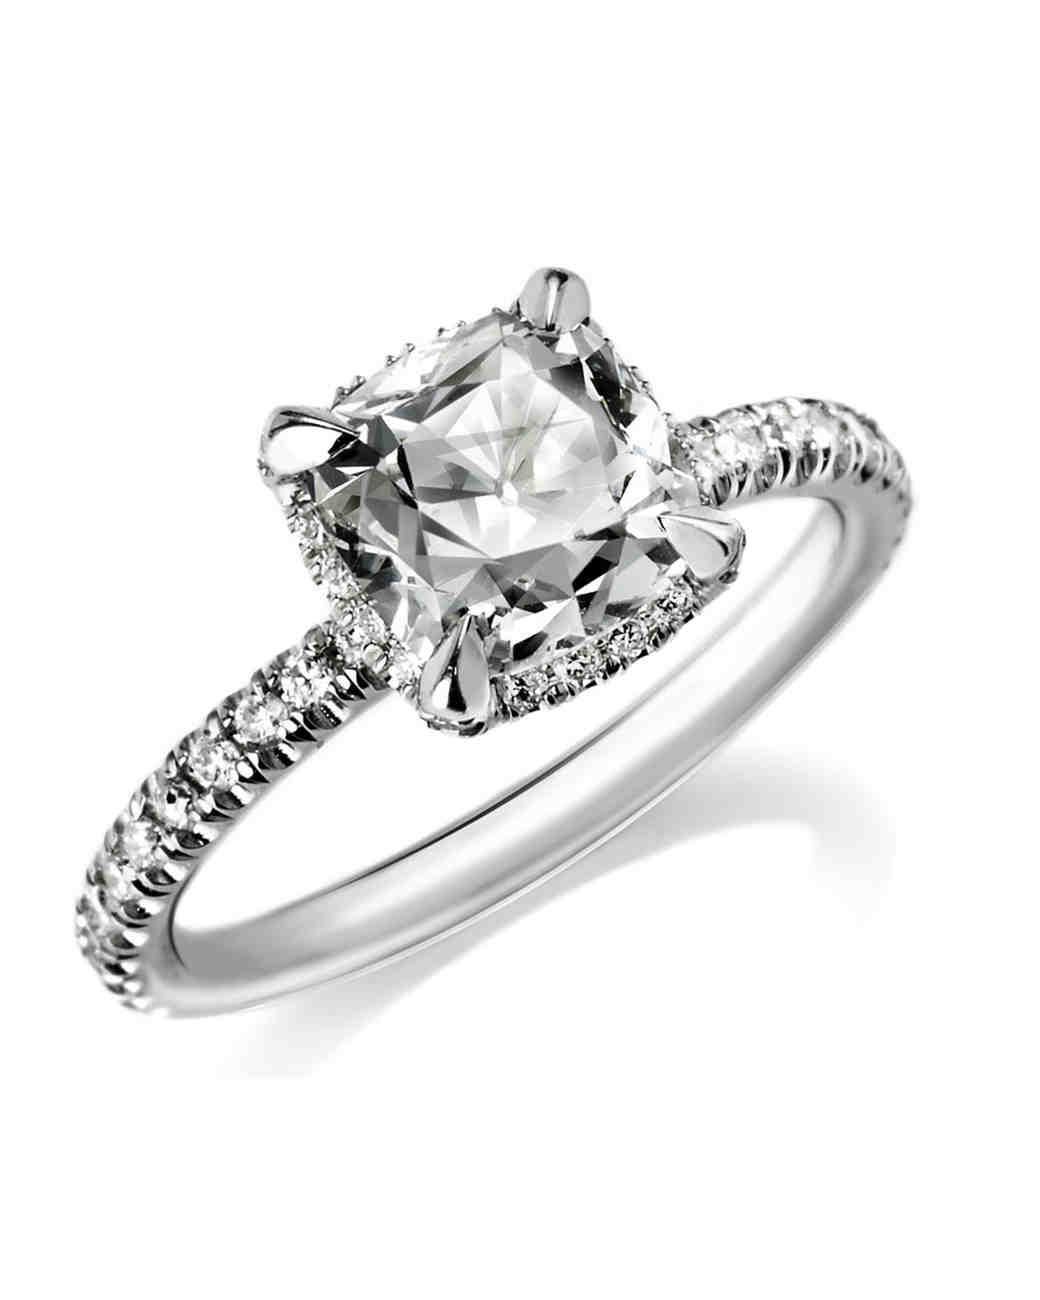 celebrity-rings-david-alan-chrissy-teigen-0316.jpg